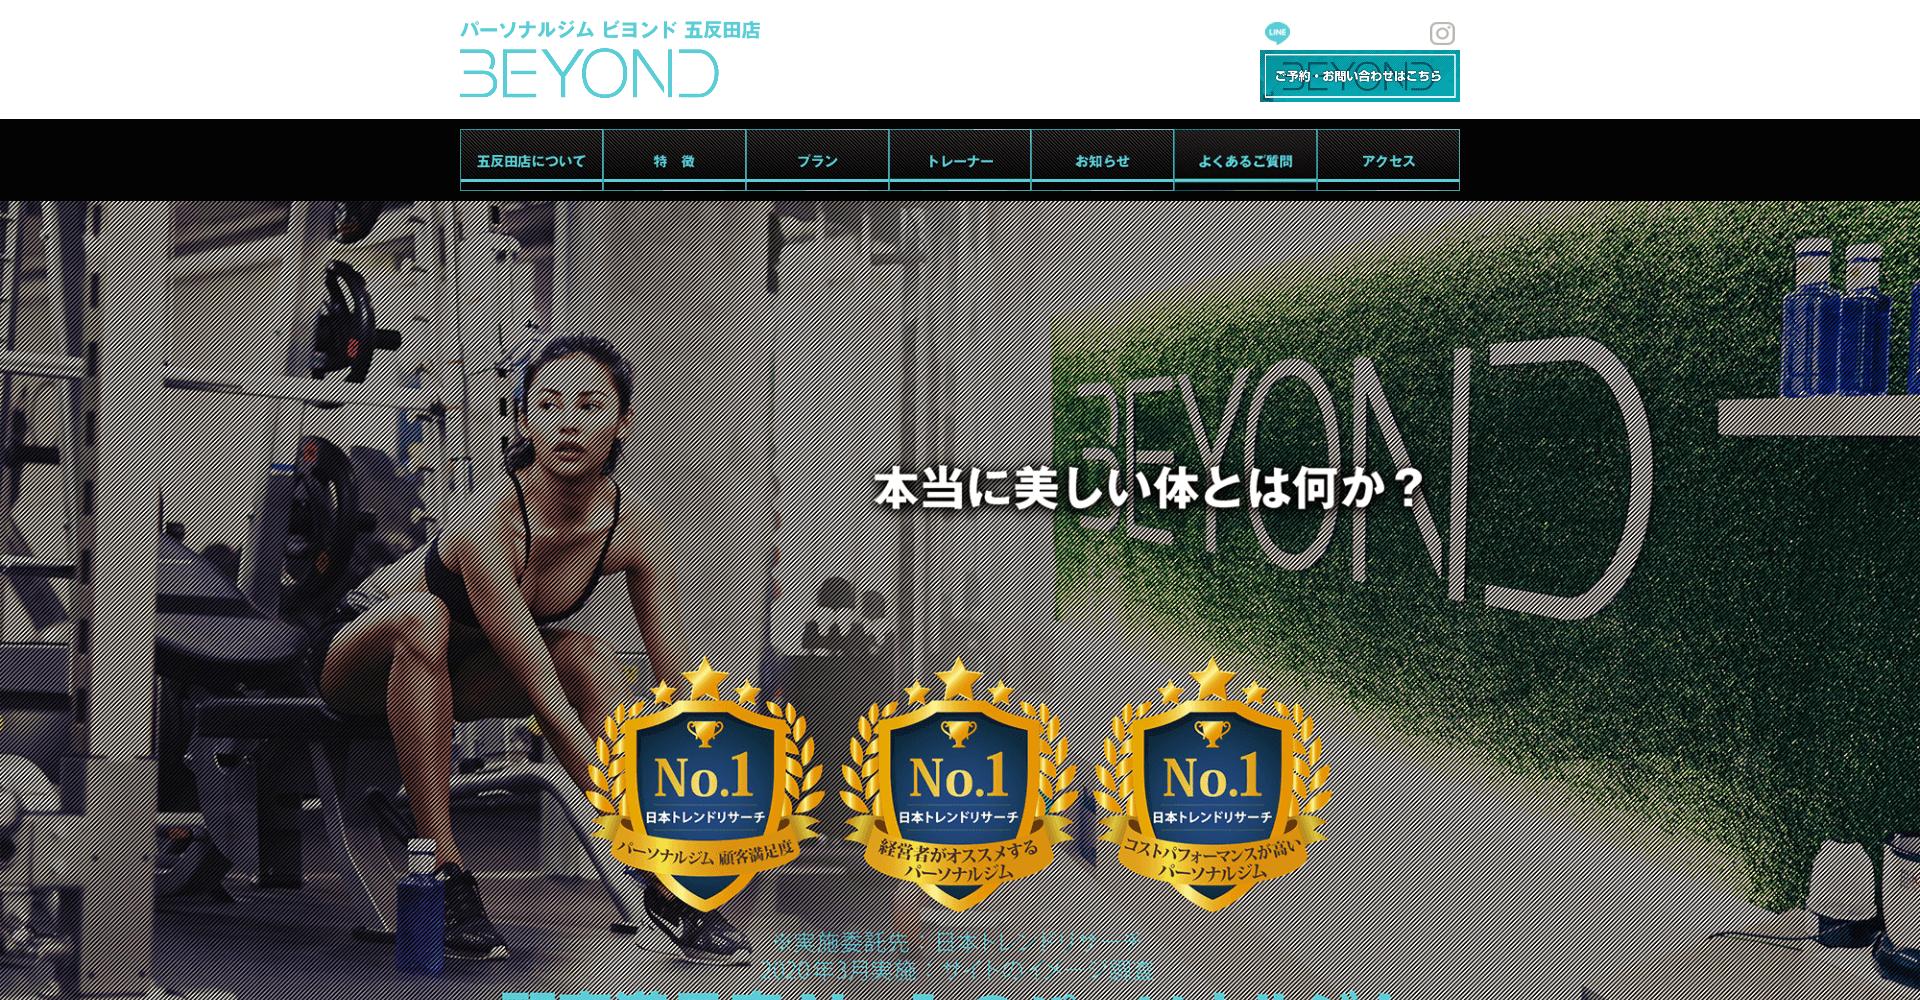 BEYOND(ビヨンド)ジム 五反田店